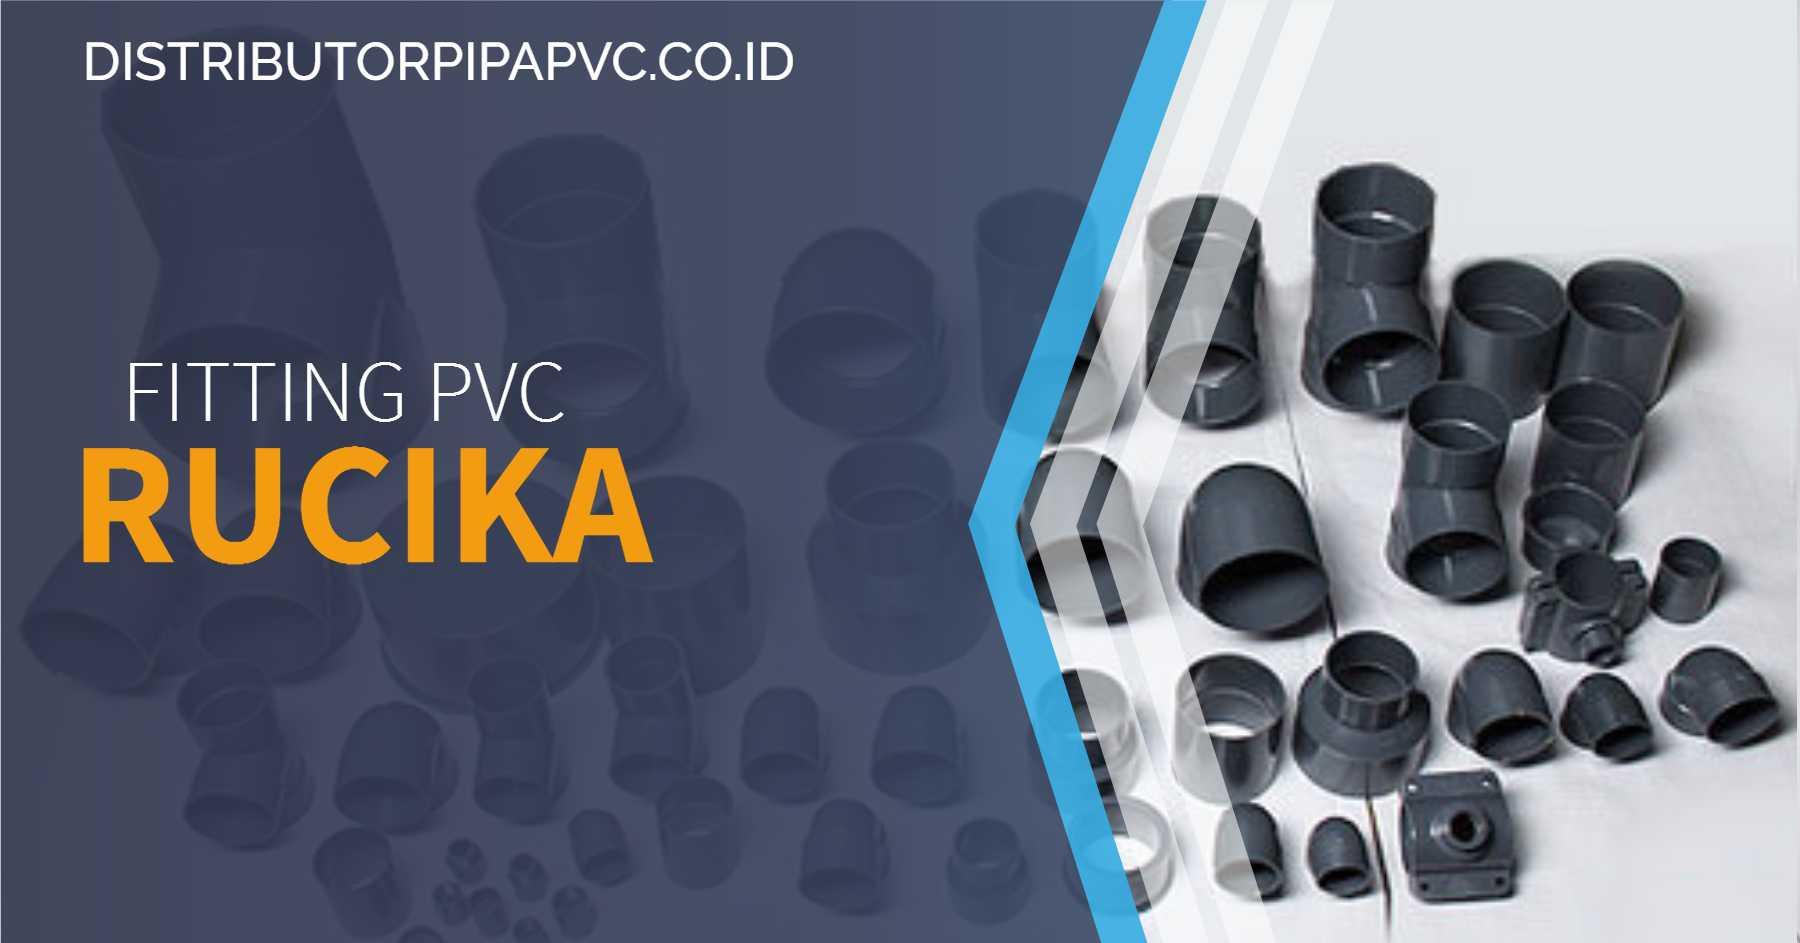 Distributor Fitting Pvc Rucika